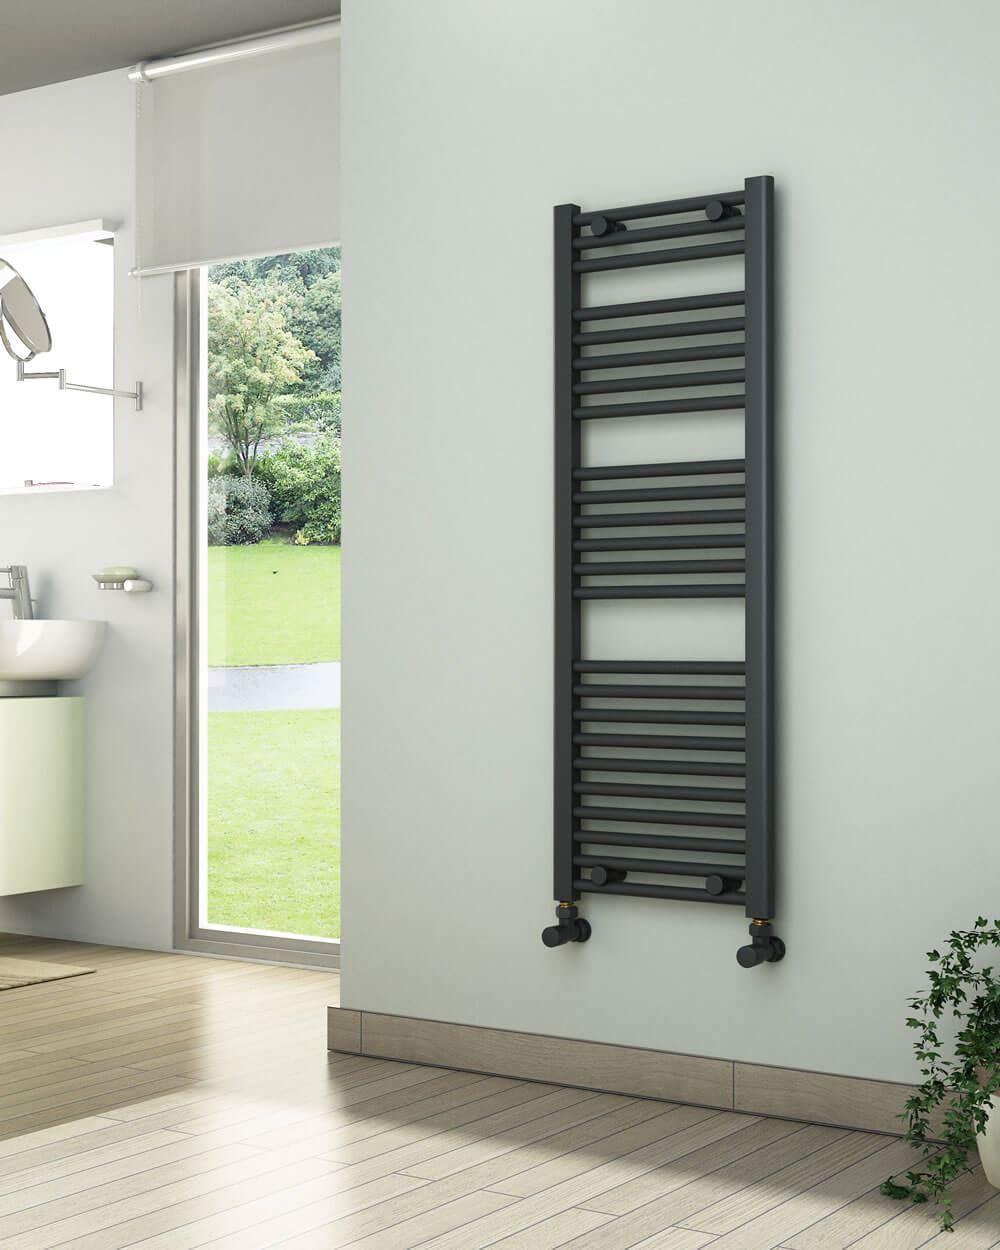 400mm Wide 1150mm High White Flat Towel Radiator - by ADIGE